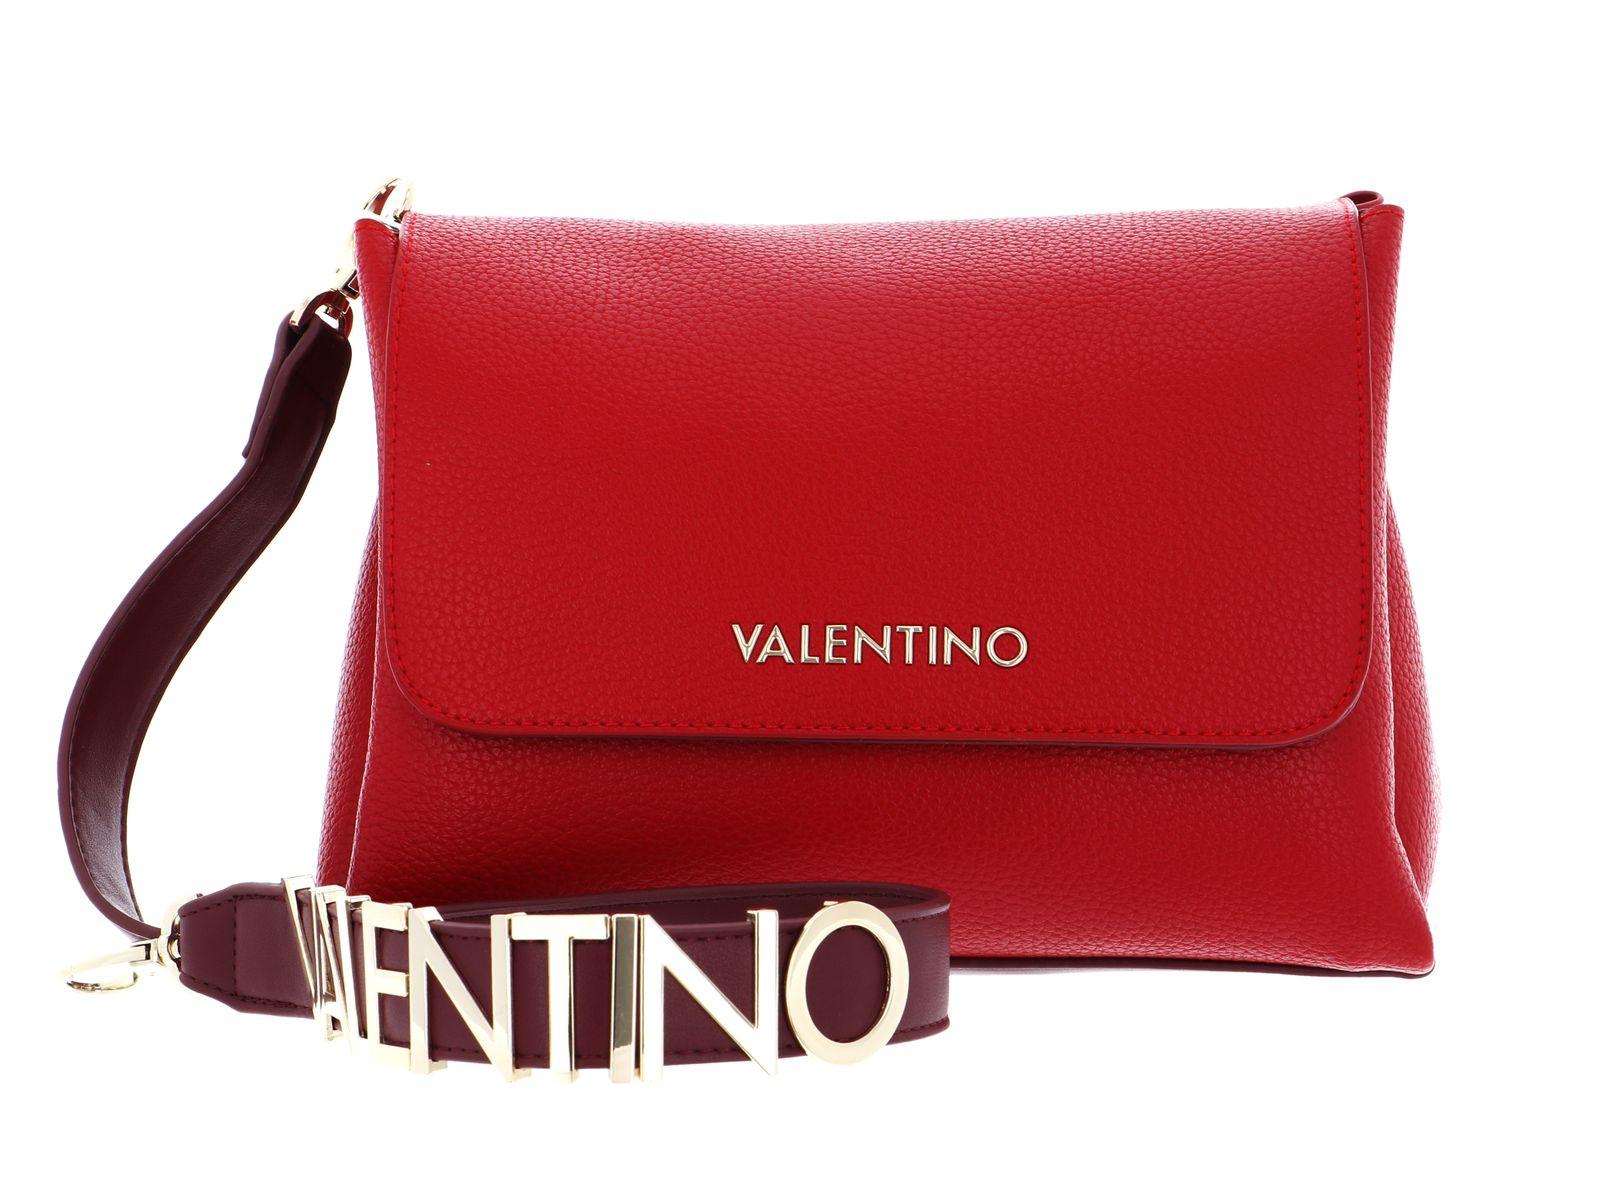 VALENTINO BAGS Alexia Crossbody Bag Rosso / Multicolor